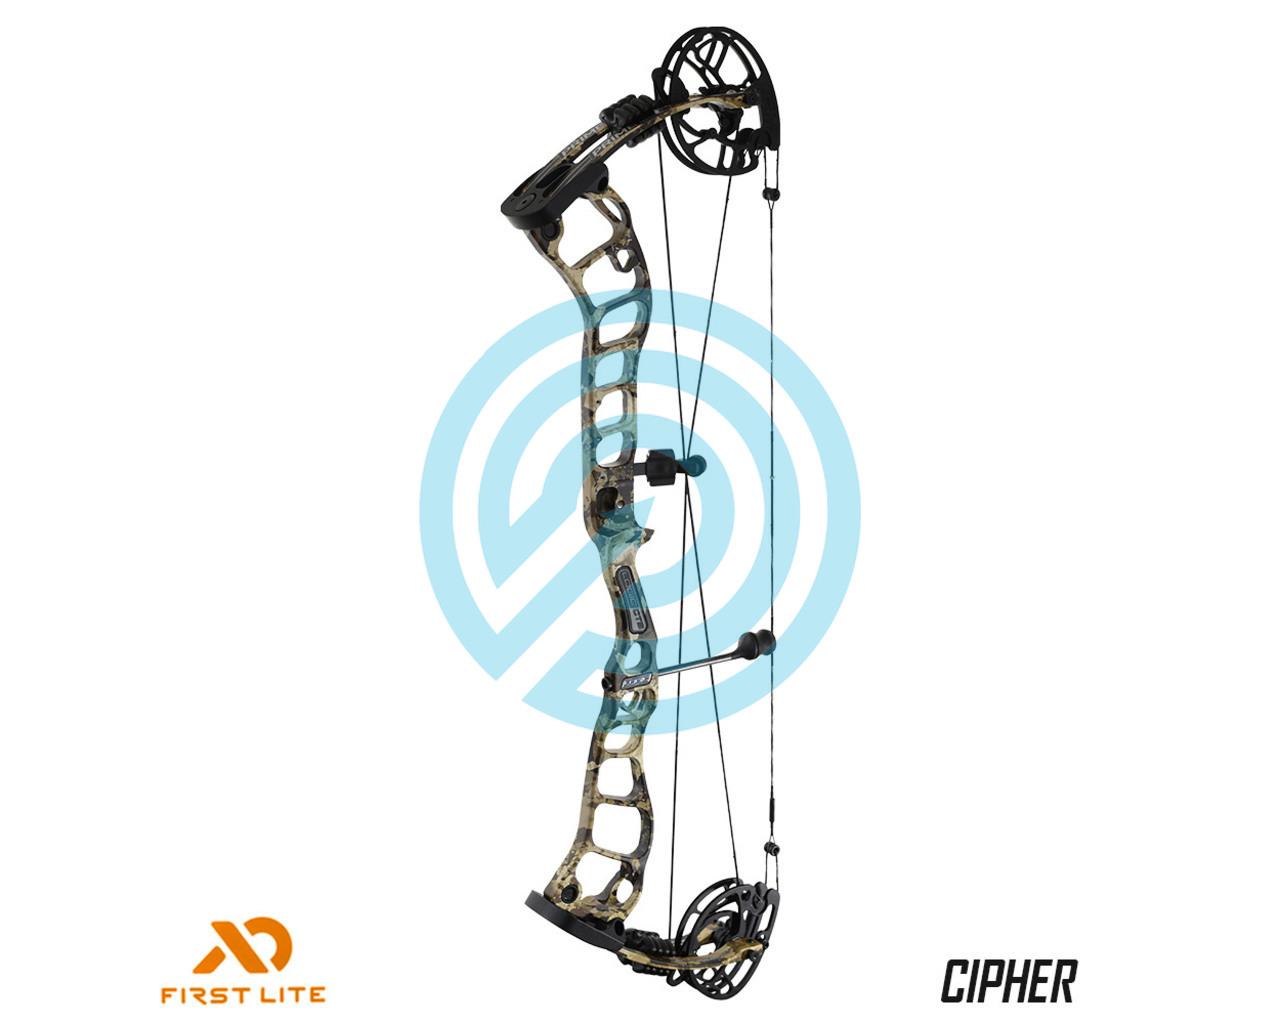 Prime Compound Bow Logic CT5 | 116138-1000 | JVD Archery